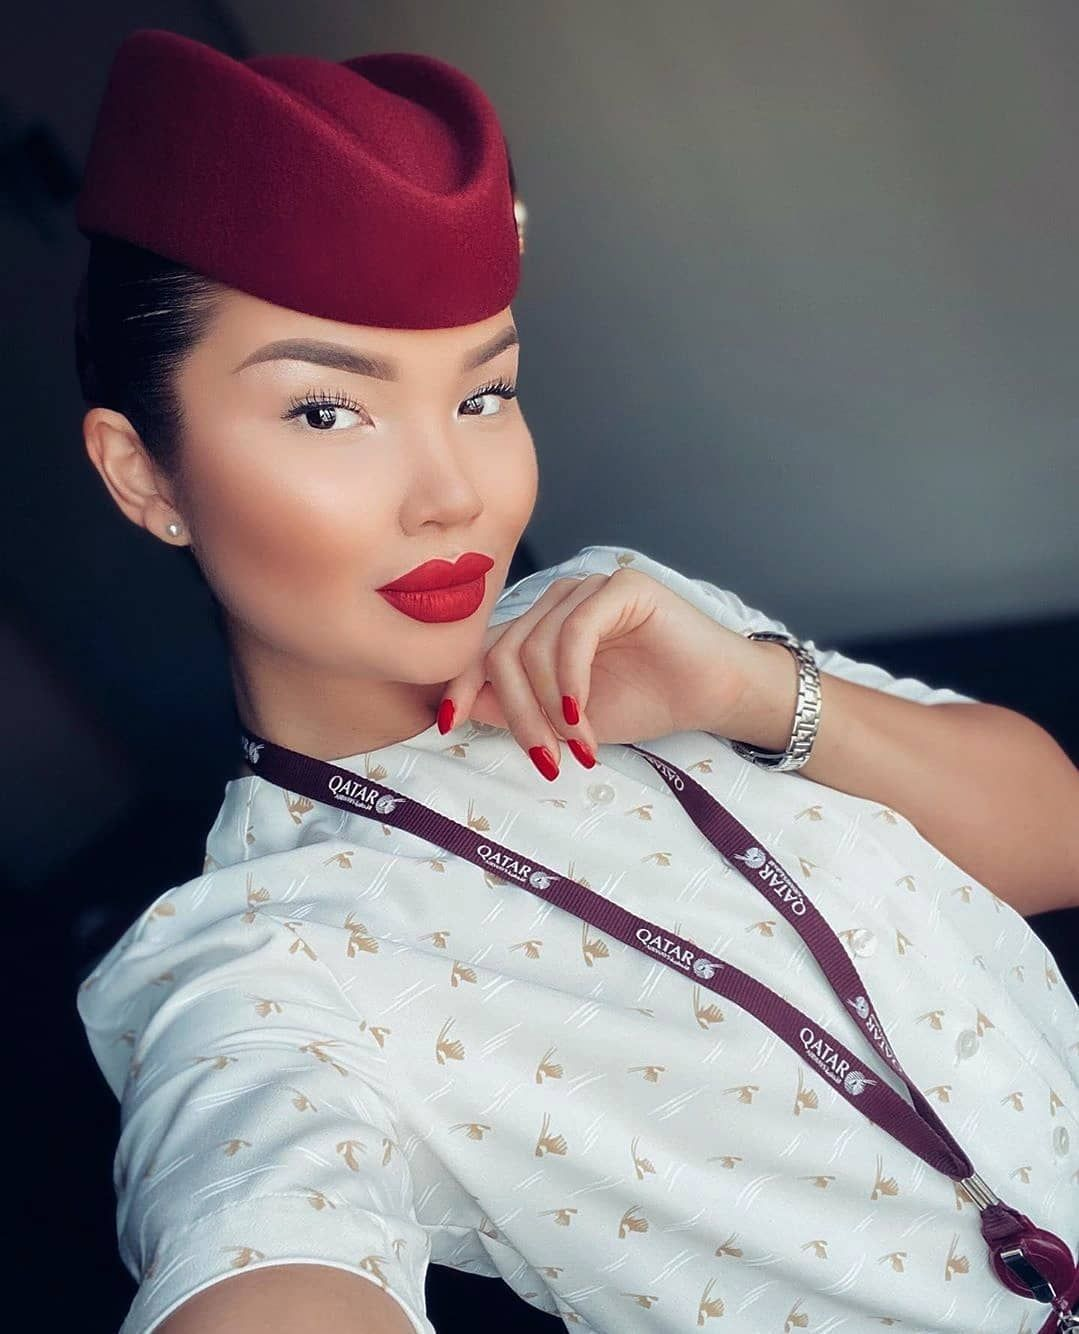 252 Likes, 3 Comments QR CREW QATAR AIRWAYS CREW